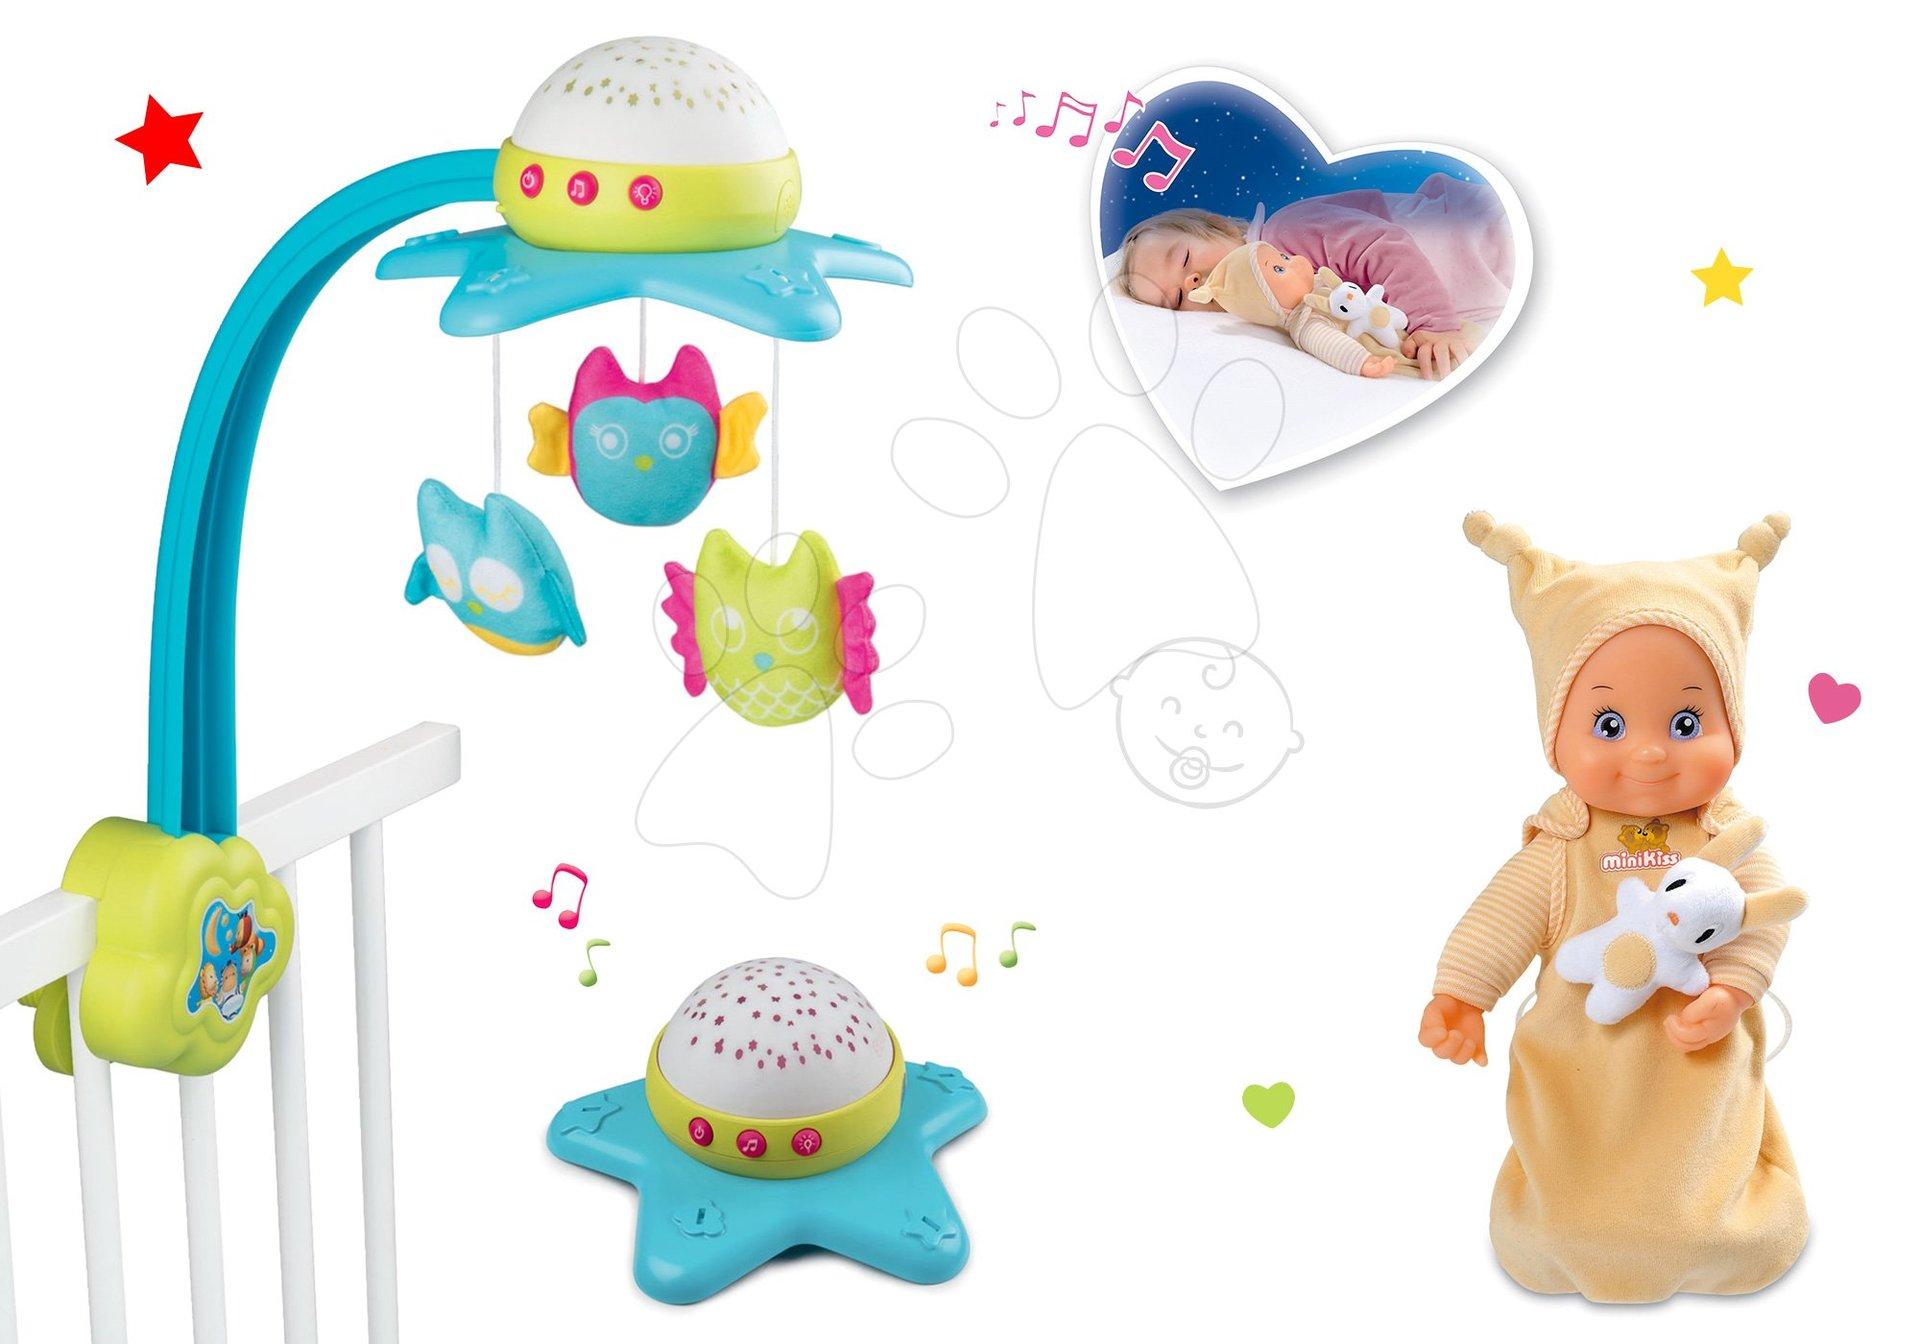 Hračky pro miminka - Set kolotoč nad postýlku Star Cotoons 2v1 Smoby se sovičkami a moje první panenka MiniKiss do postýlky